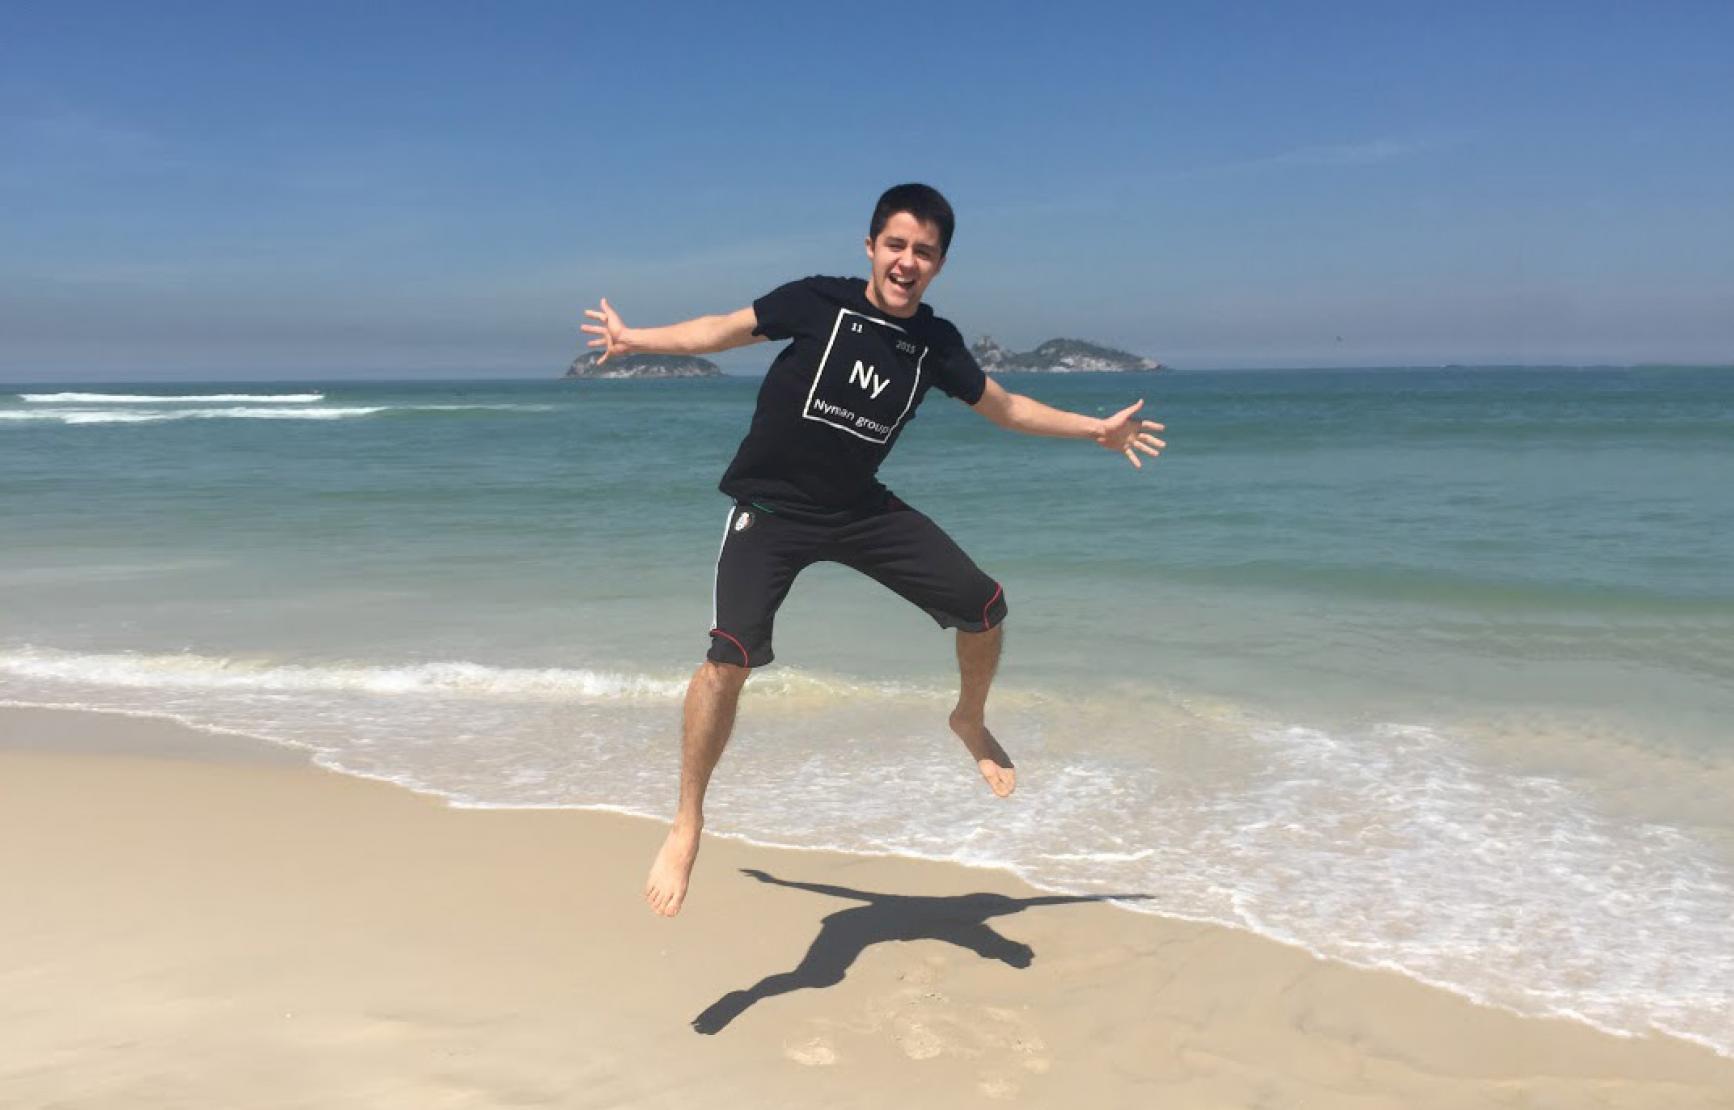 Collin Muniz wearing a chemistry t-shirt jumping on the beach